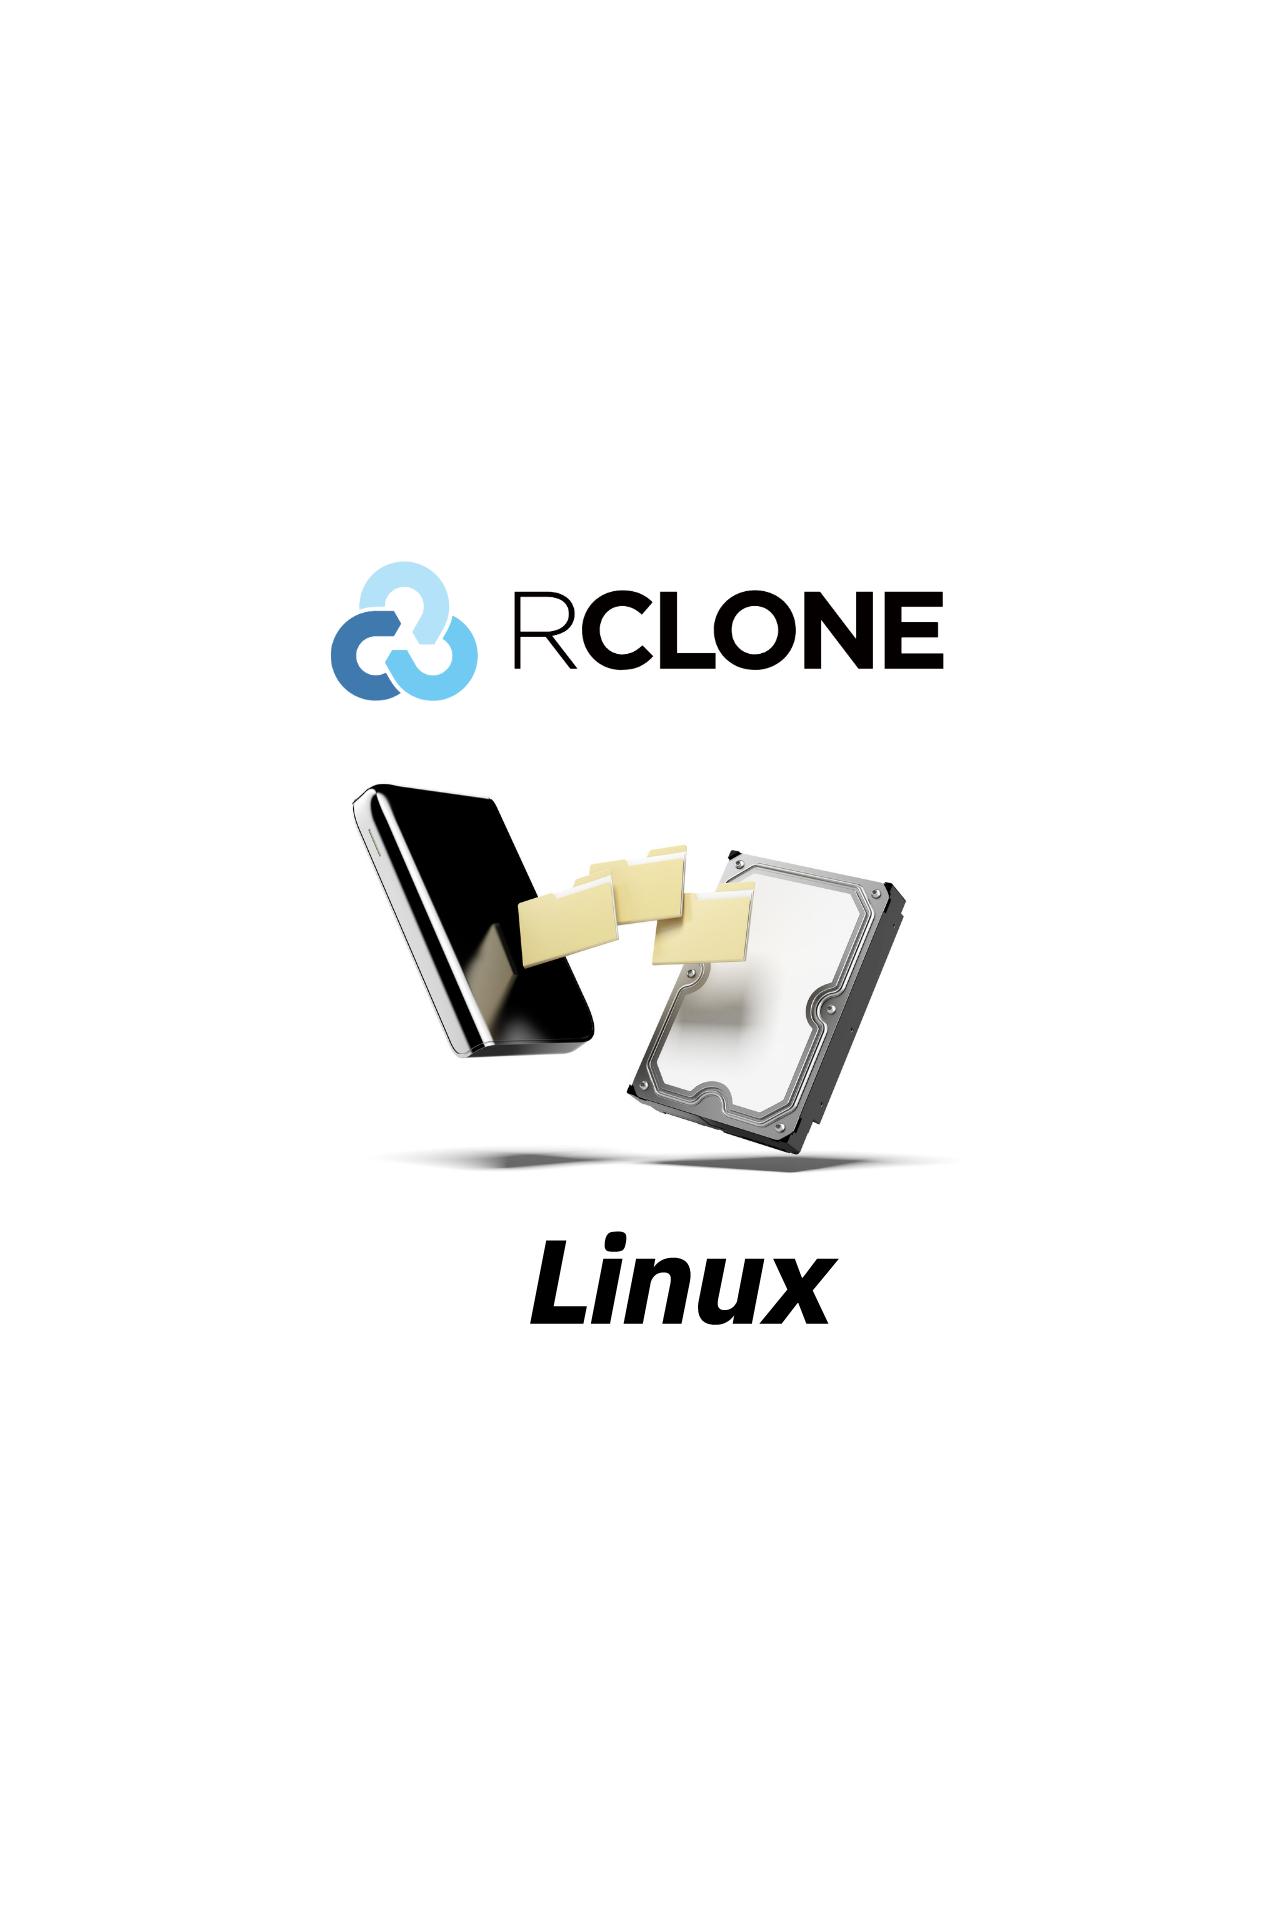 Rclone挂载OneDrive为本地硬盘-Linux篇